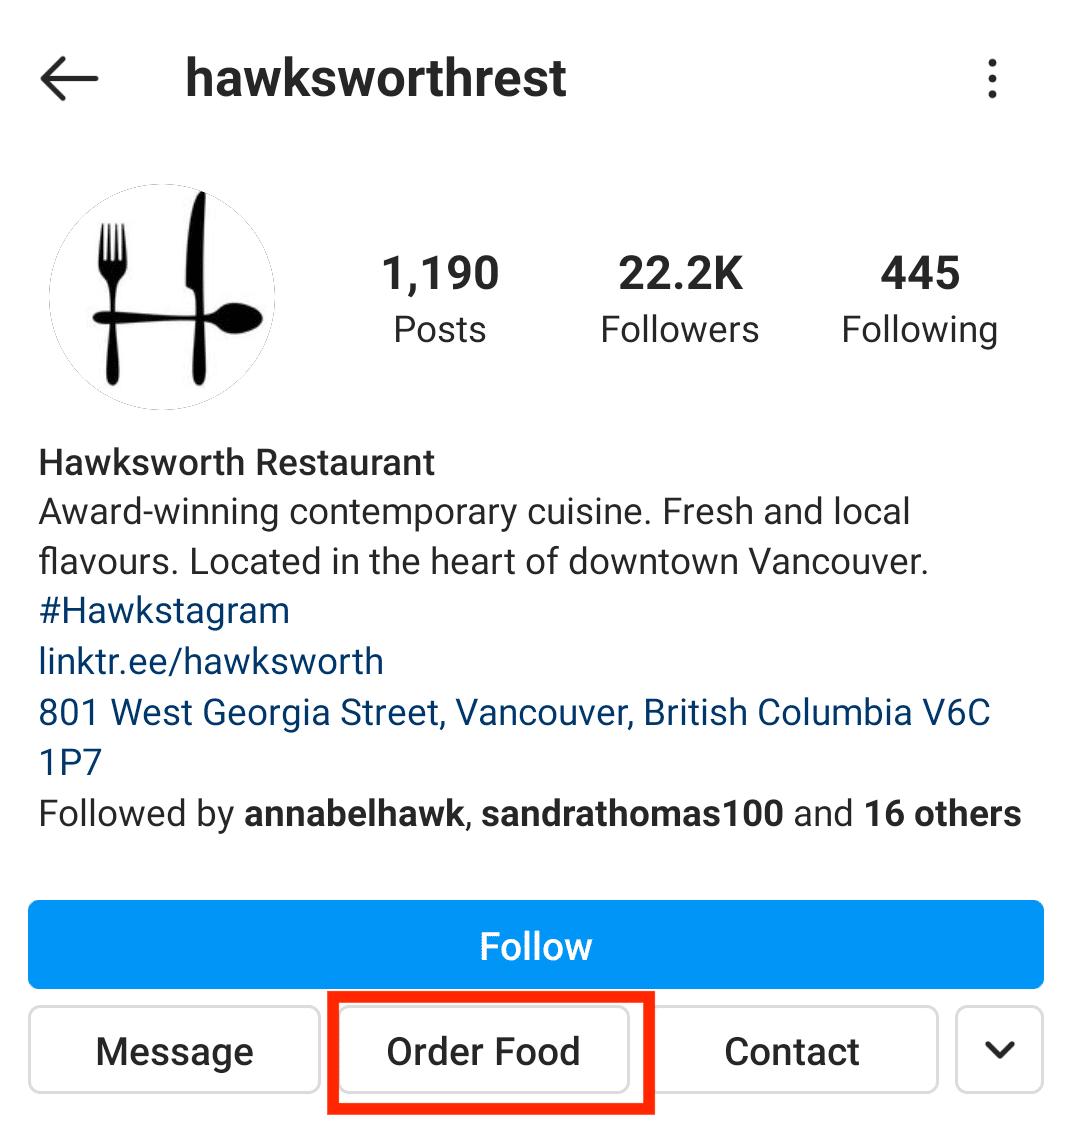 Кнопка заказа еды в ресторане Hawksworth